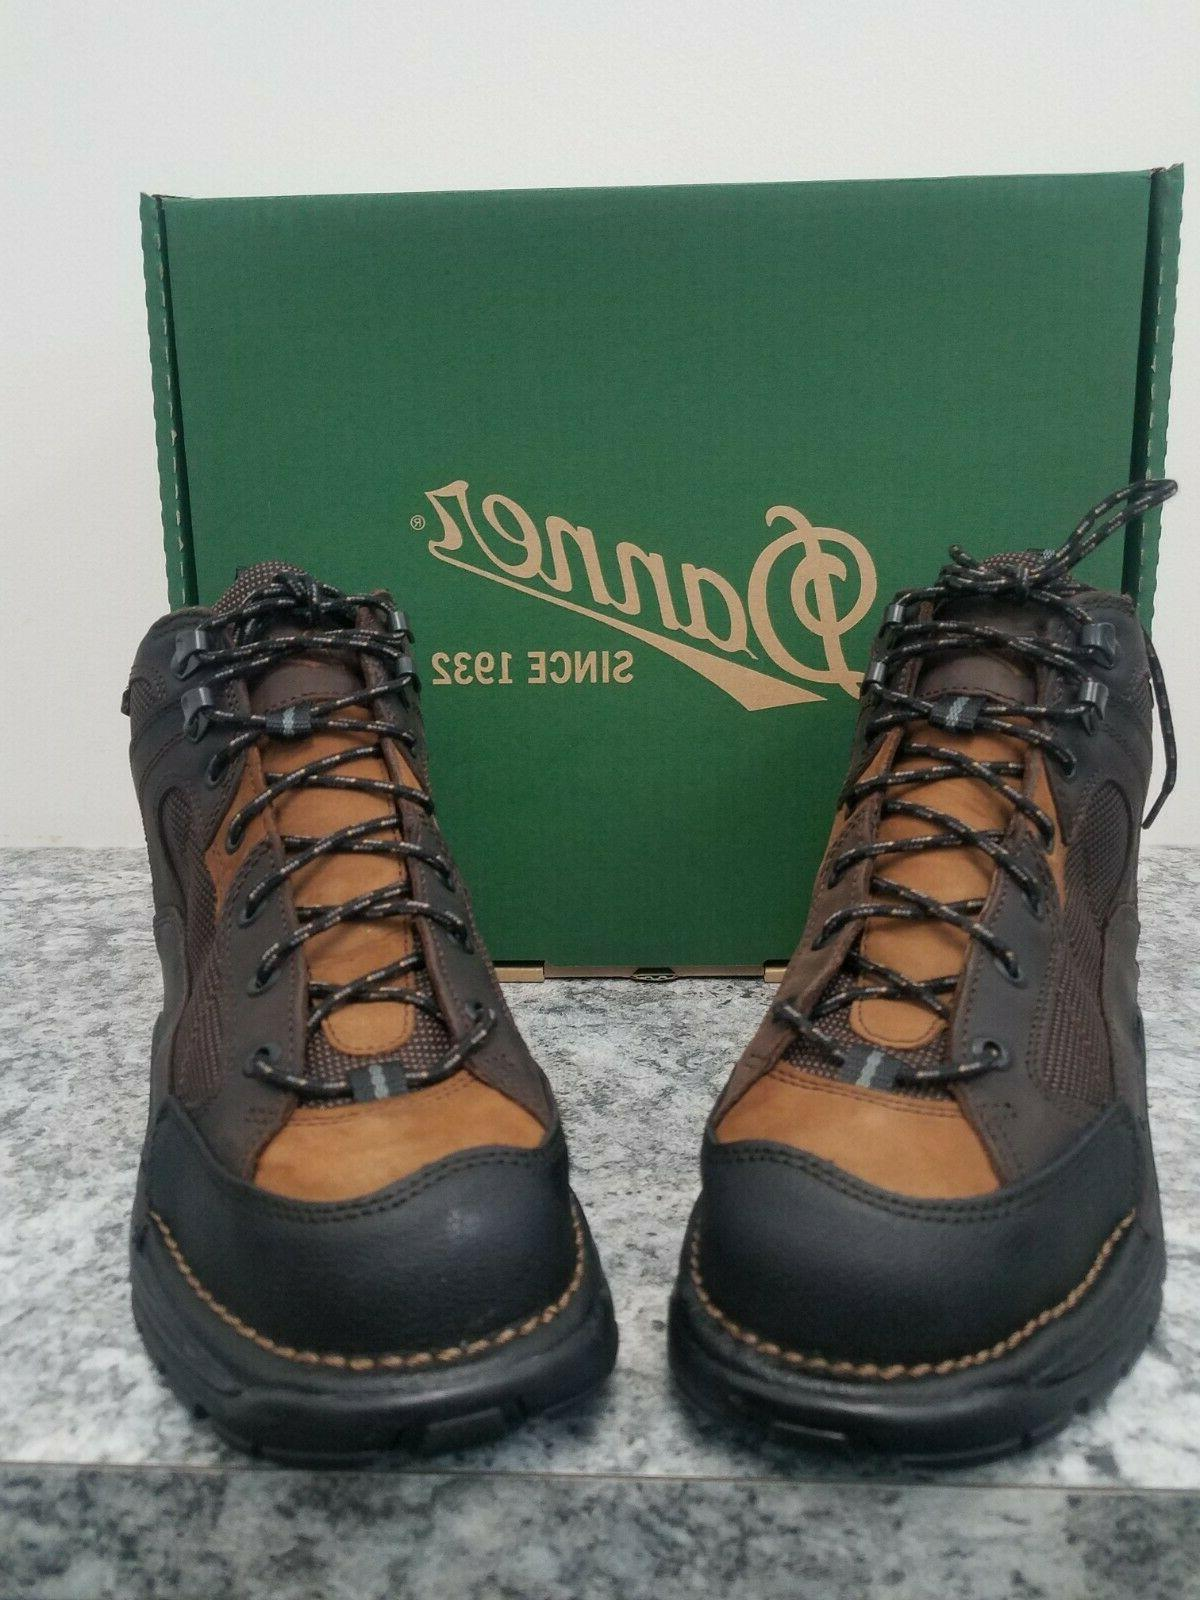 452 gtx steel toe hiking boots final